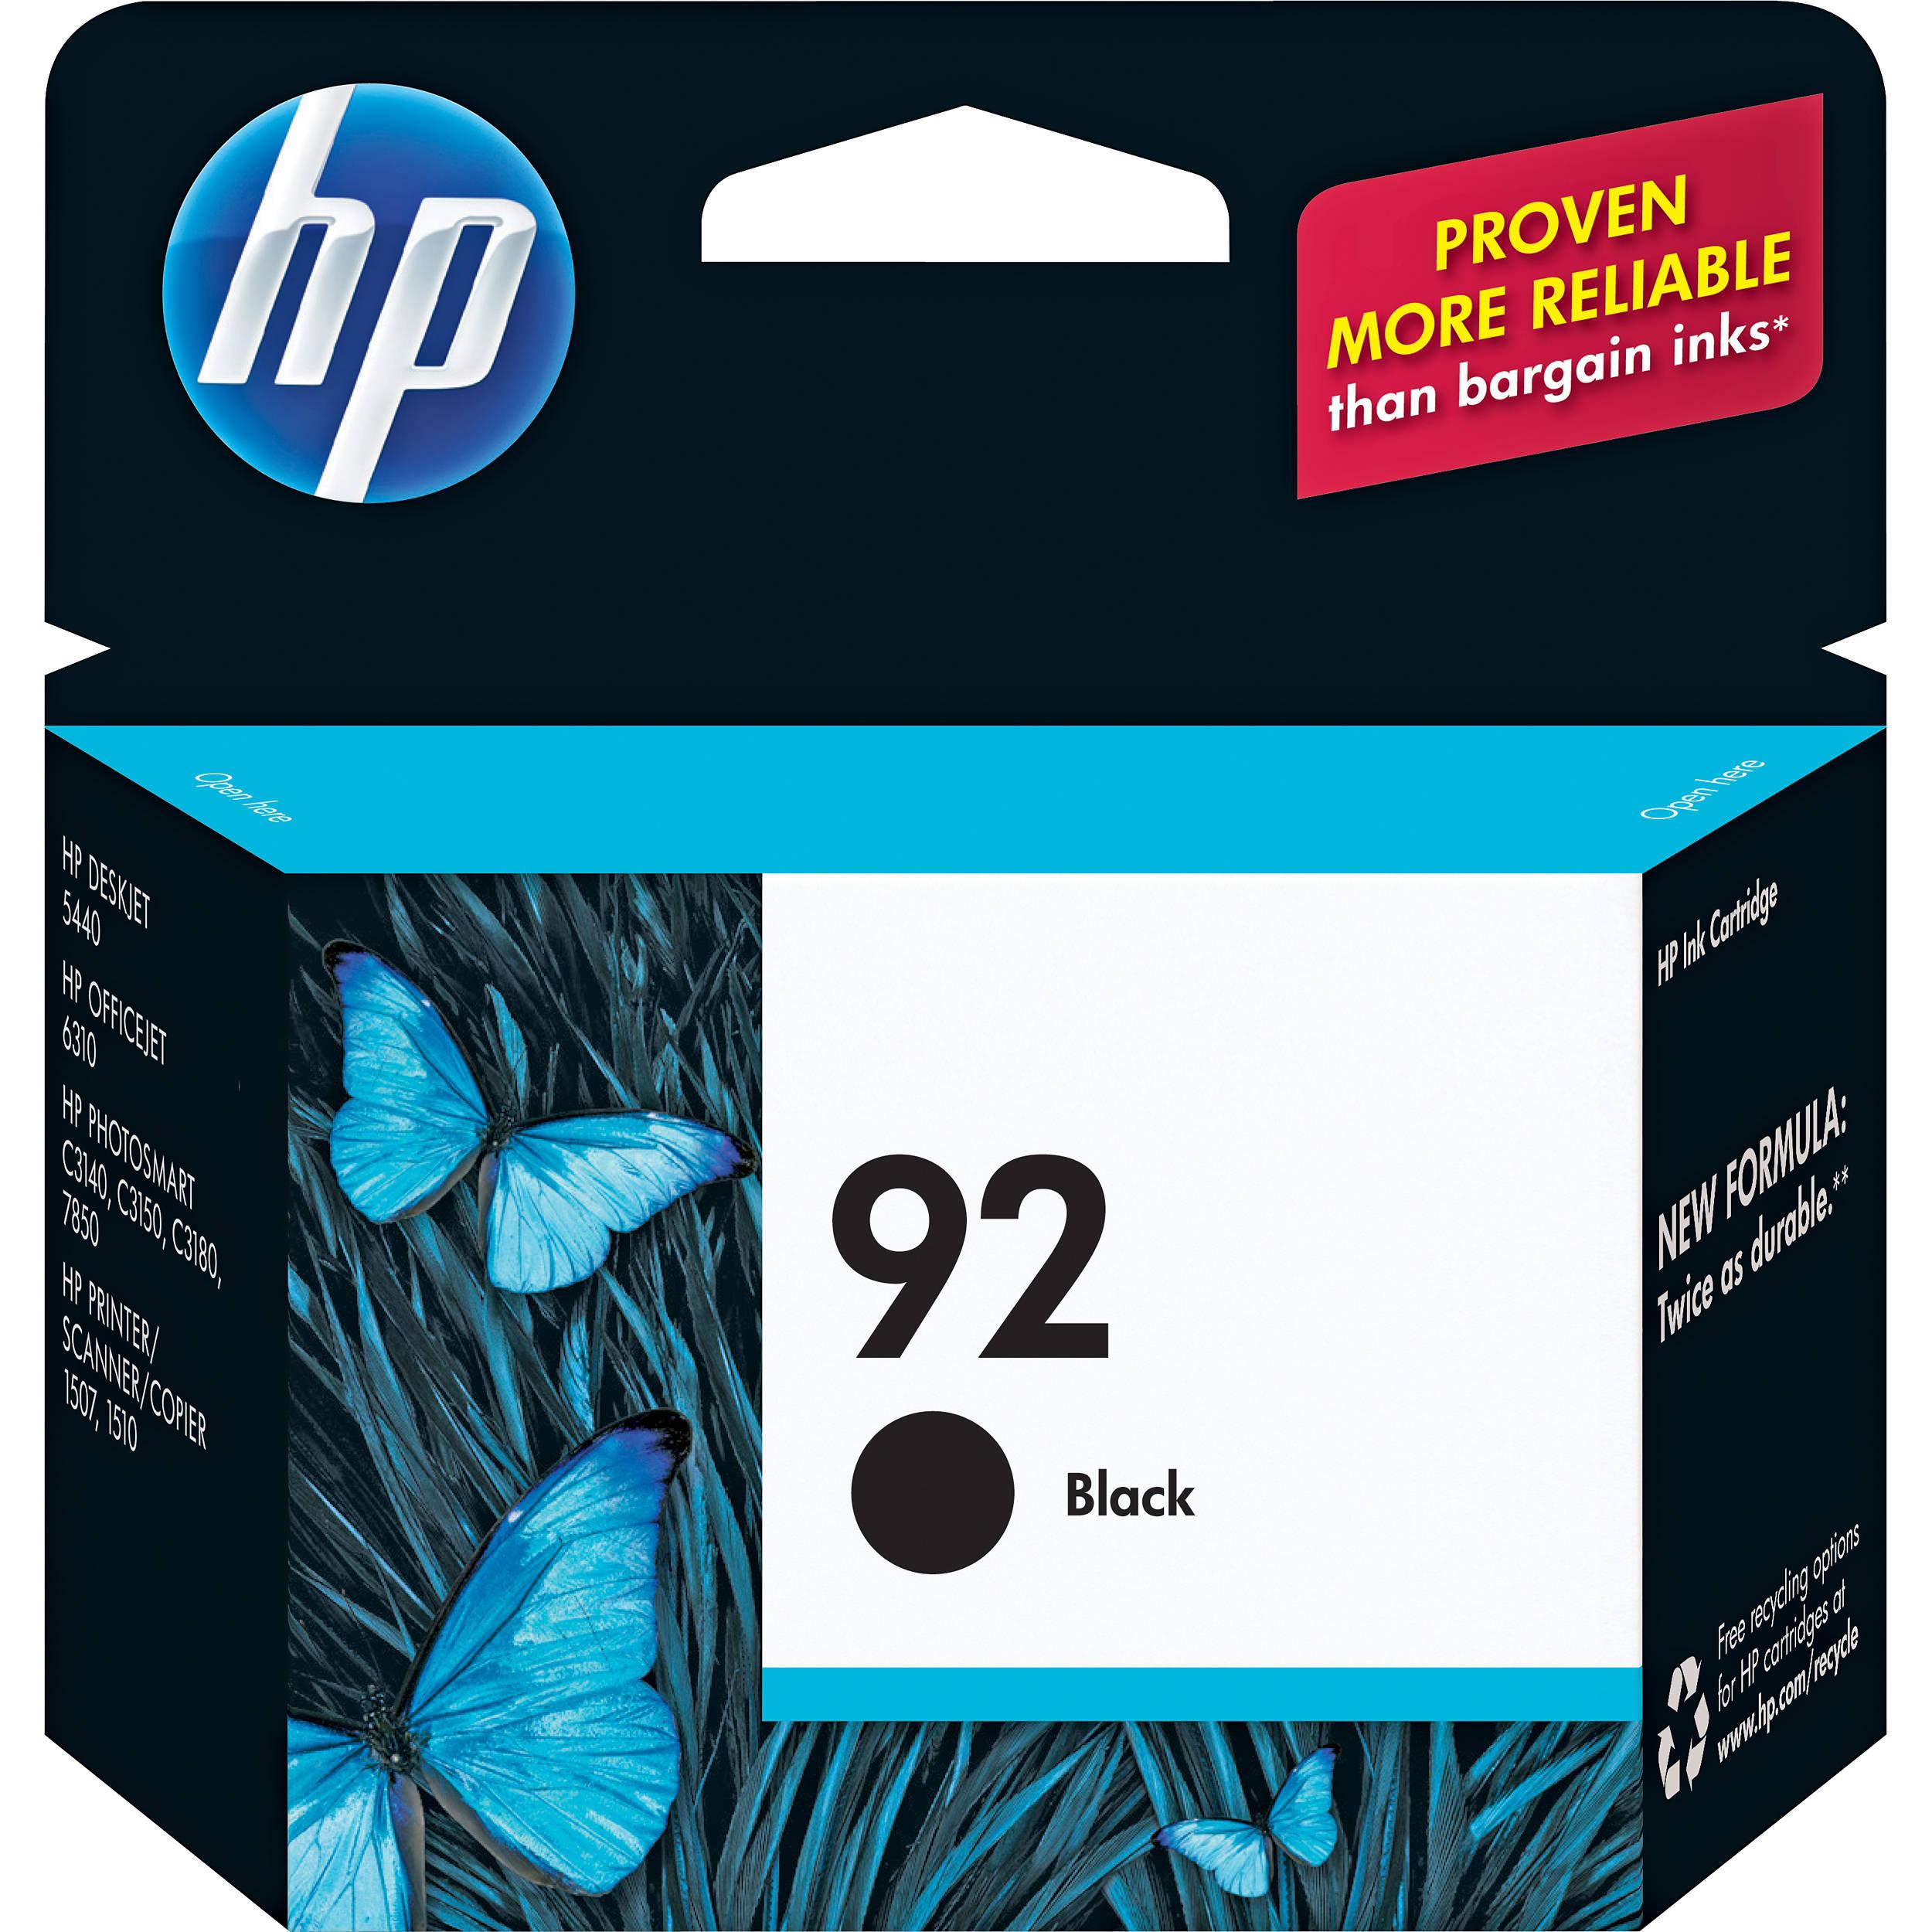 Hp psc 1510 printer